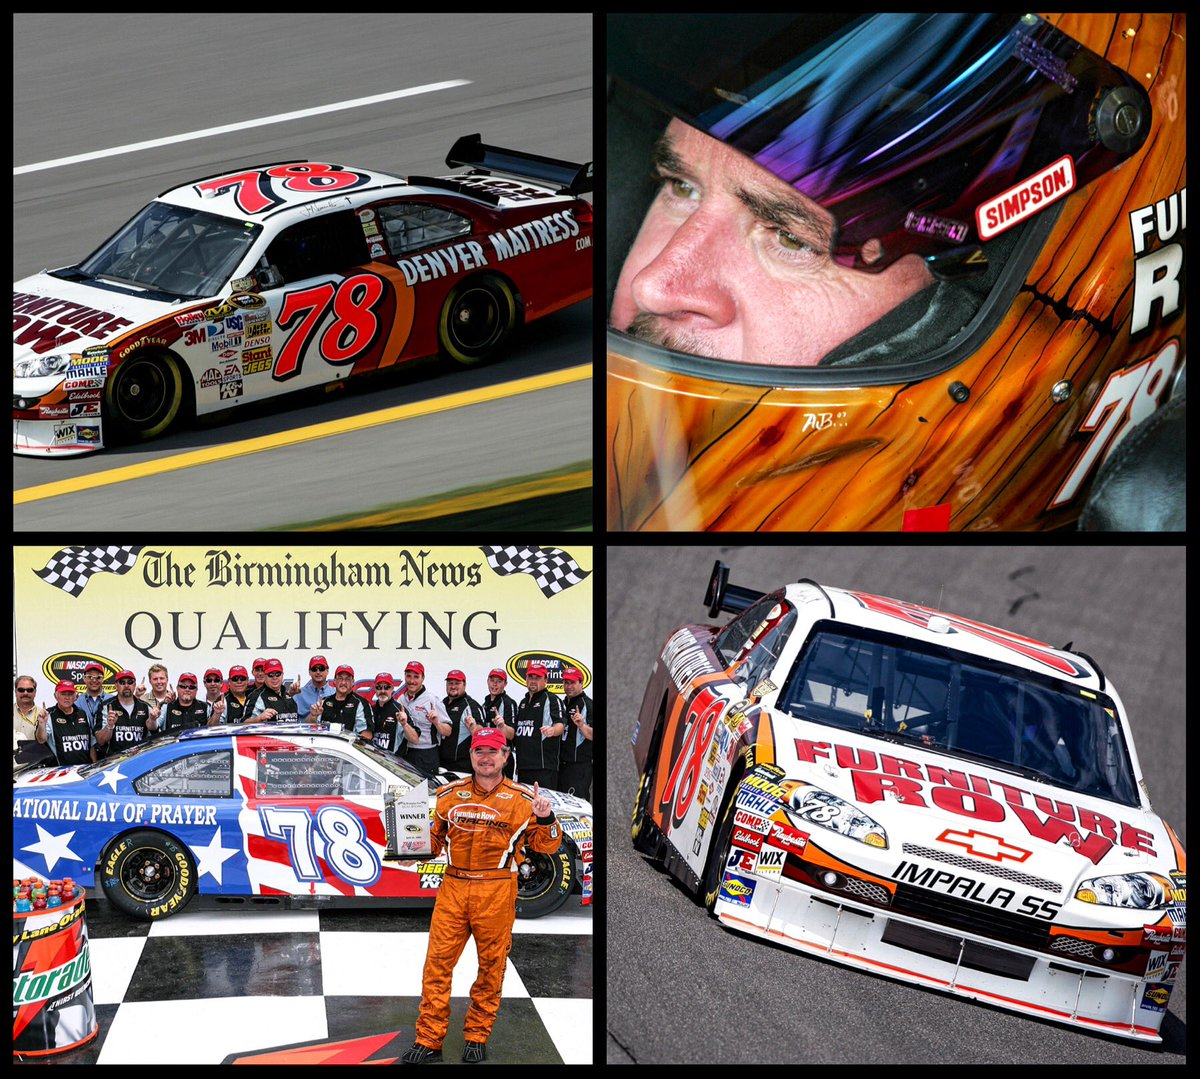 Only 7️⃣8️⃣ days until the 59th annual #Daytona500 at the @DISupdates. #NASCAR #DaytonaDay #CountdownWithDenny https://t.co/gqhG3YNPdg